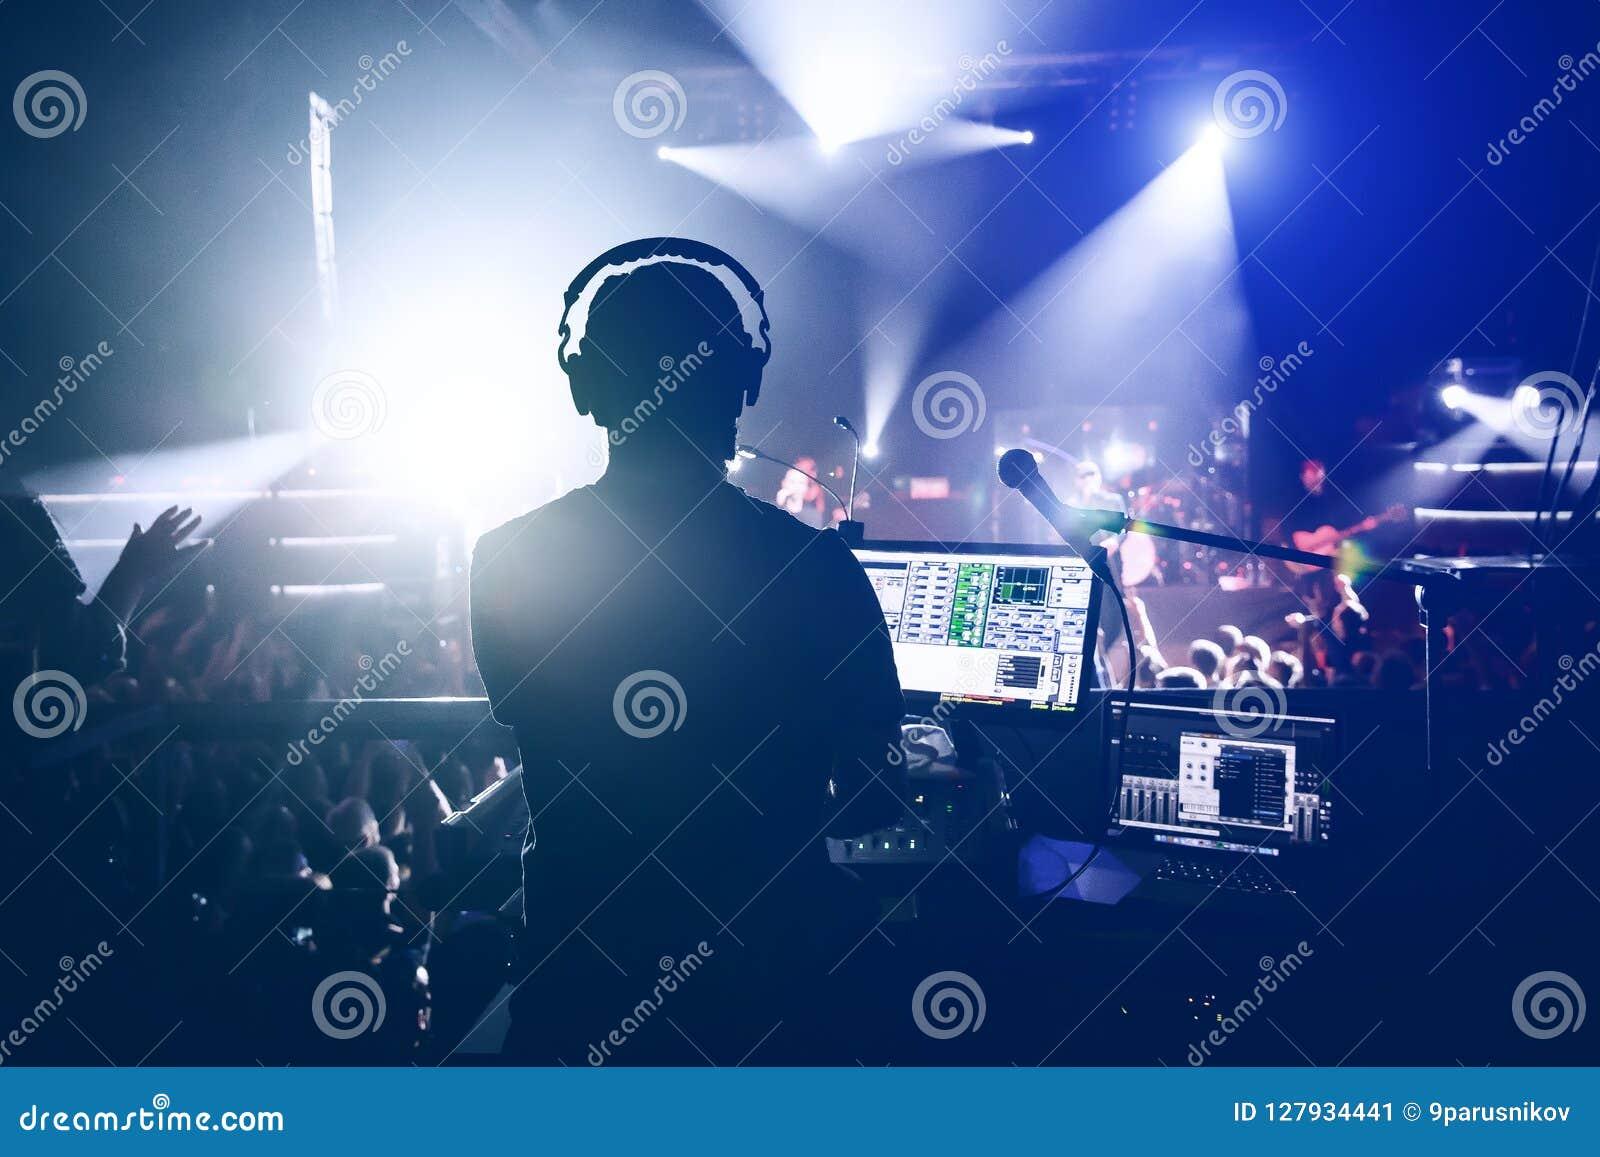 Sound engineer music producer adjusting and balancing audio on rock concert